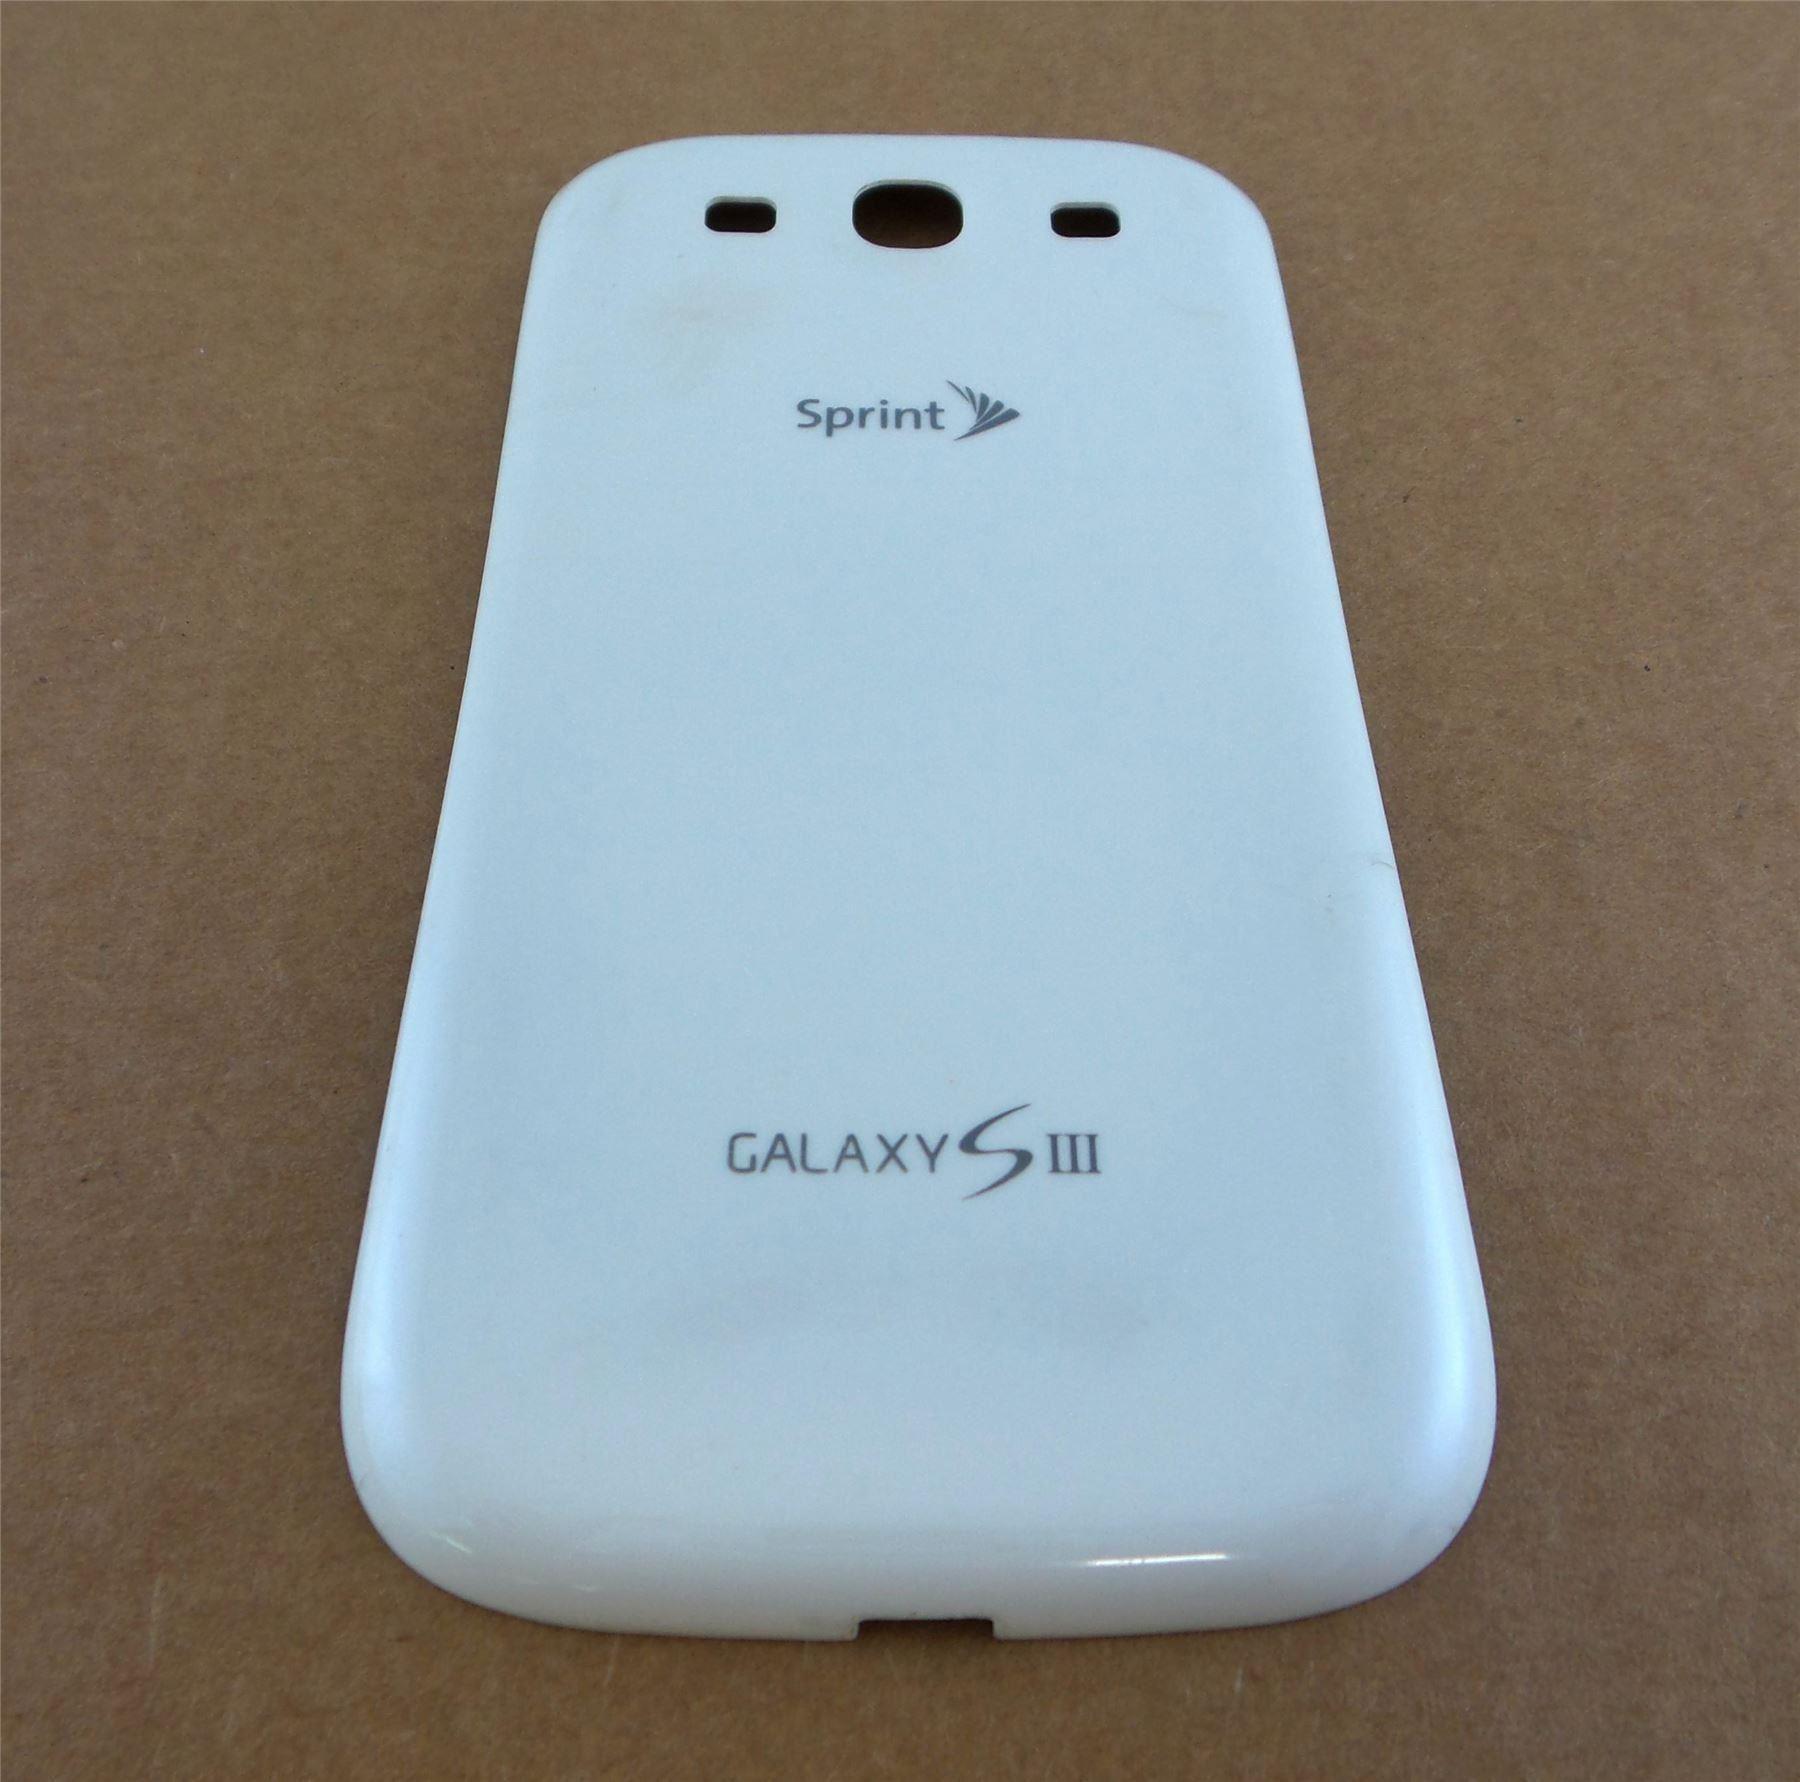 Samsung galaxy battery s3 verizon - Samsung Galaxy S3 Genuine Battery Door Cover Replacement